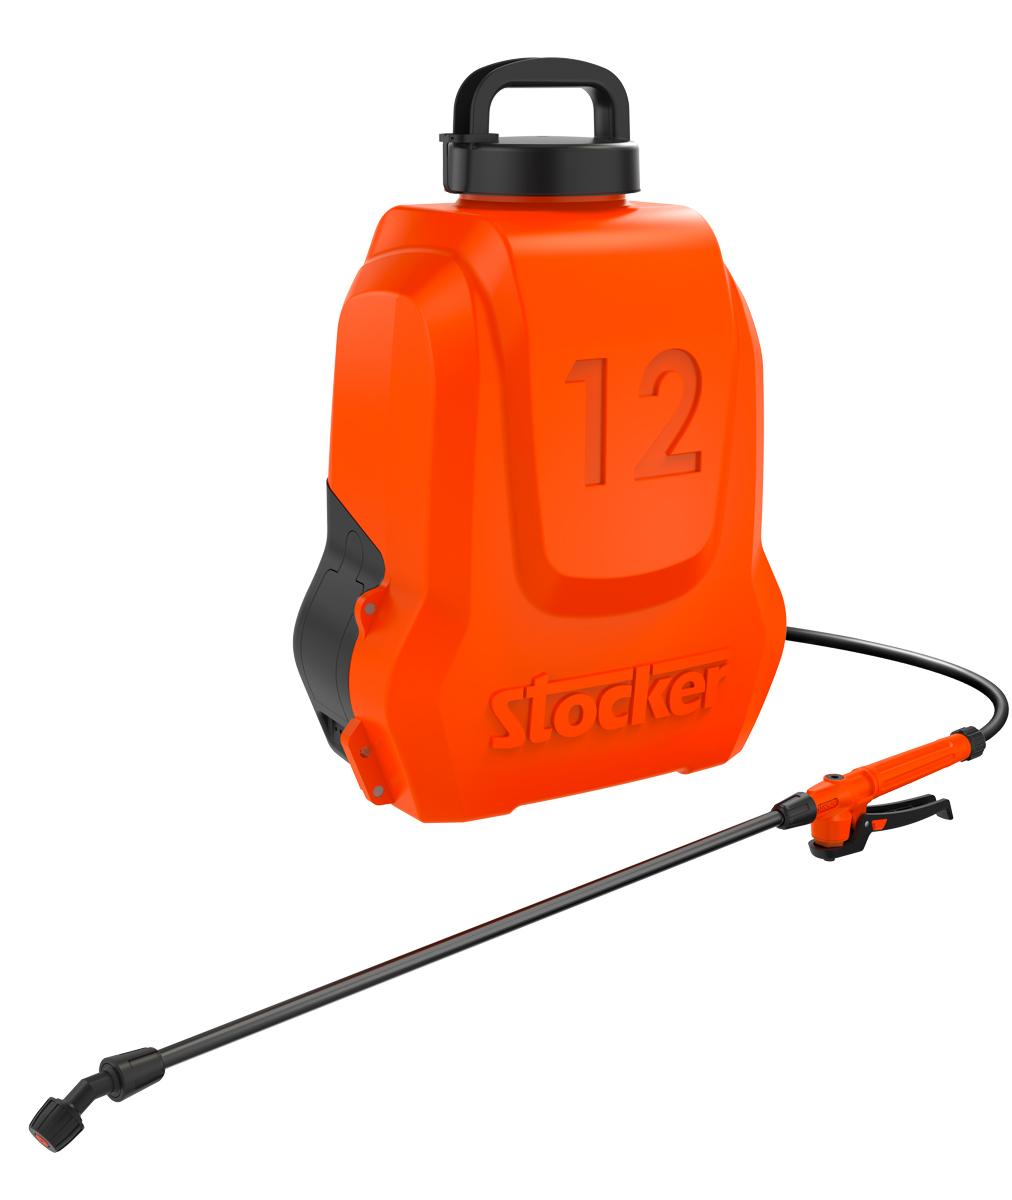 239-pompa-irroratrice-elettrica-a-zaino-li-ion-stocker-12-litri